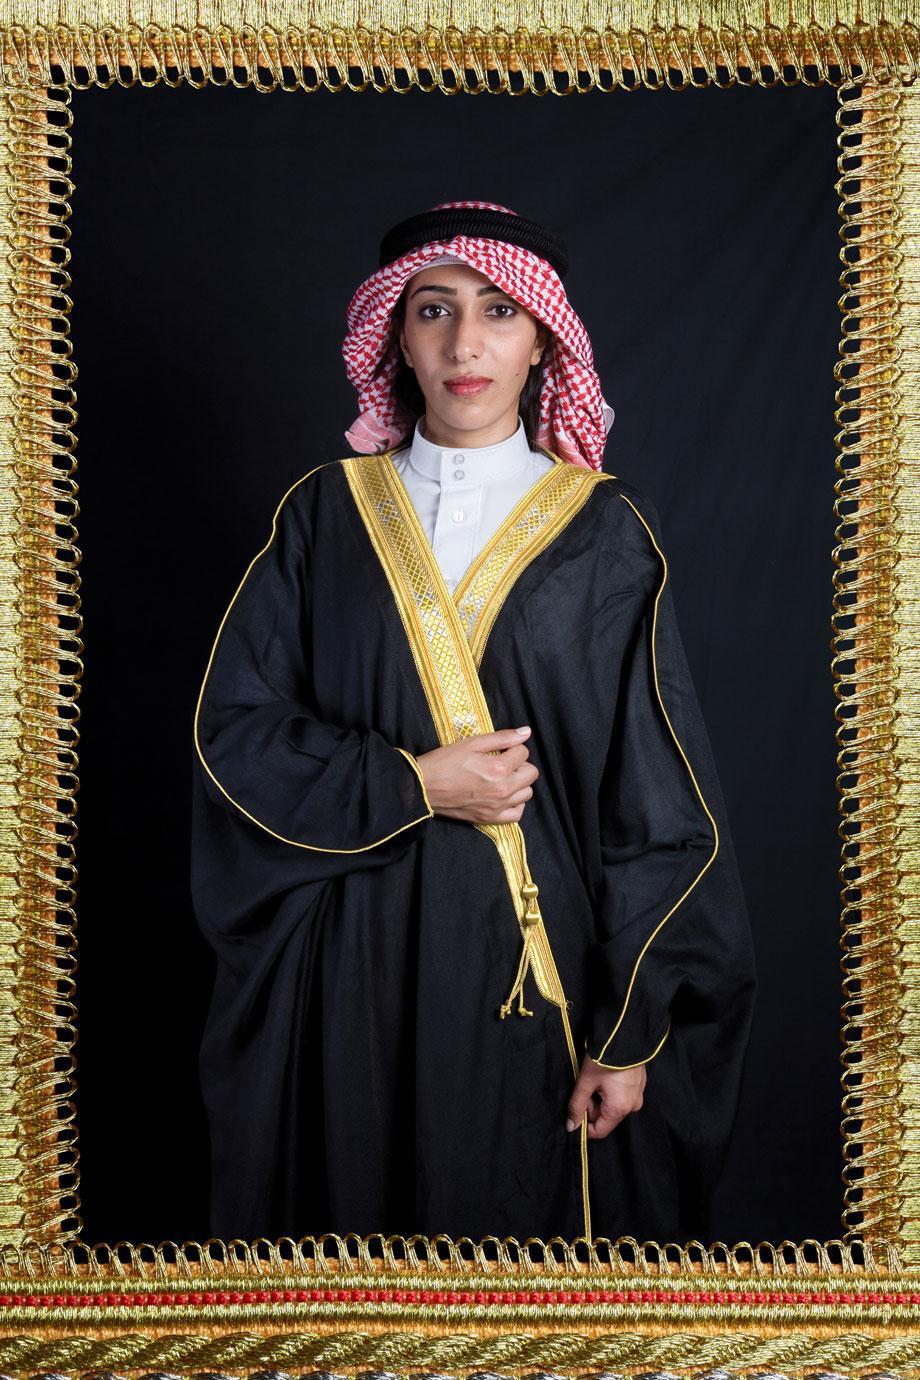 Boushra Almutawakel, Yemeni photographer